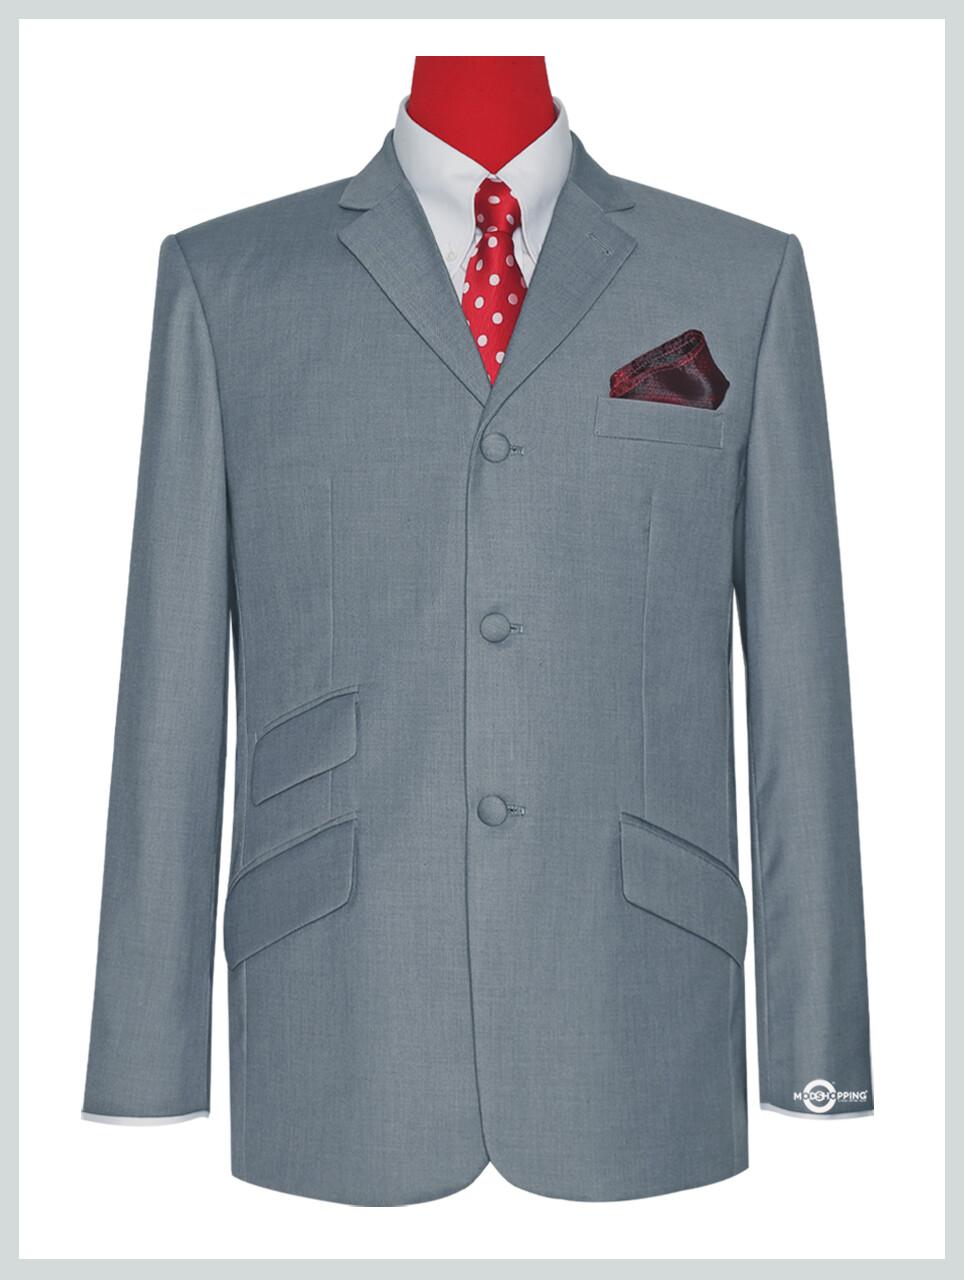 Men's Light Grey 3 Button Blazer Jacket.